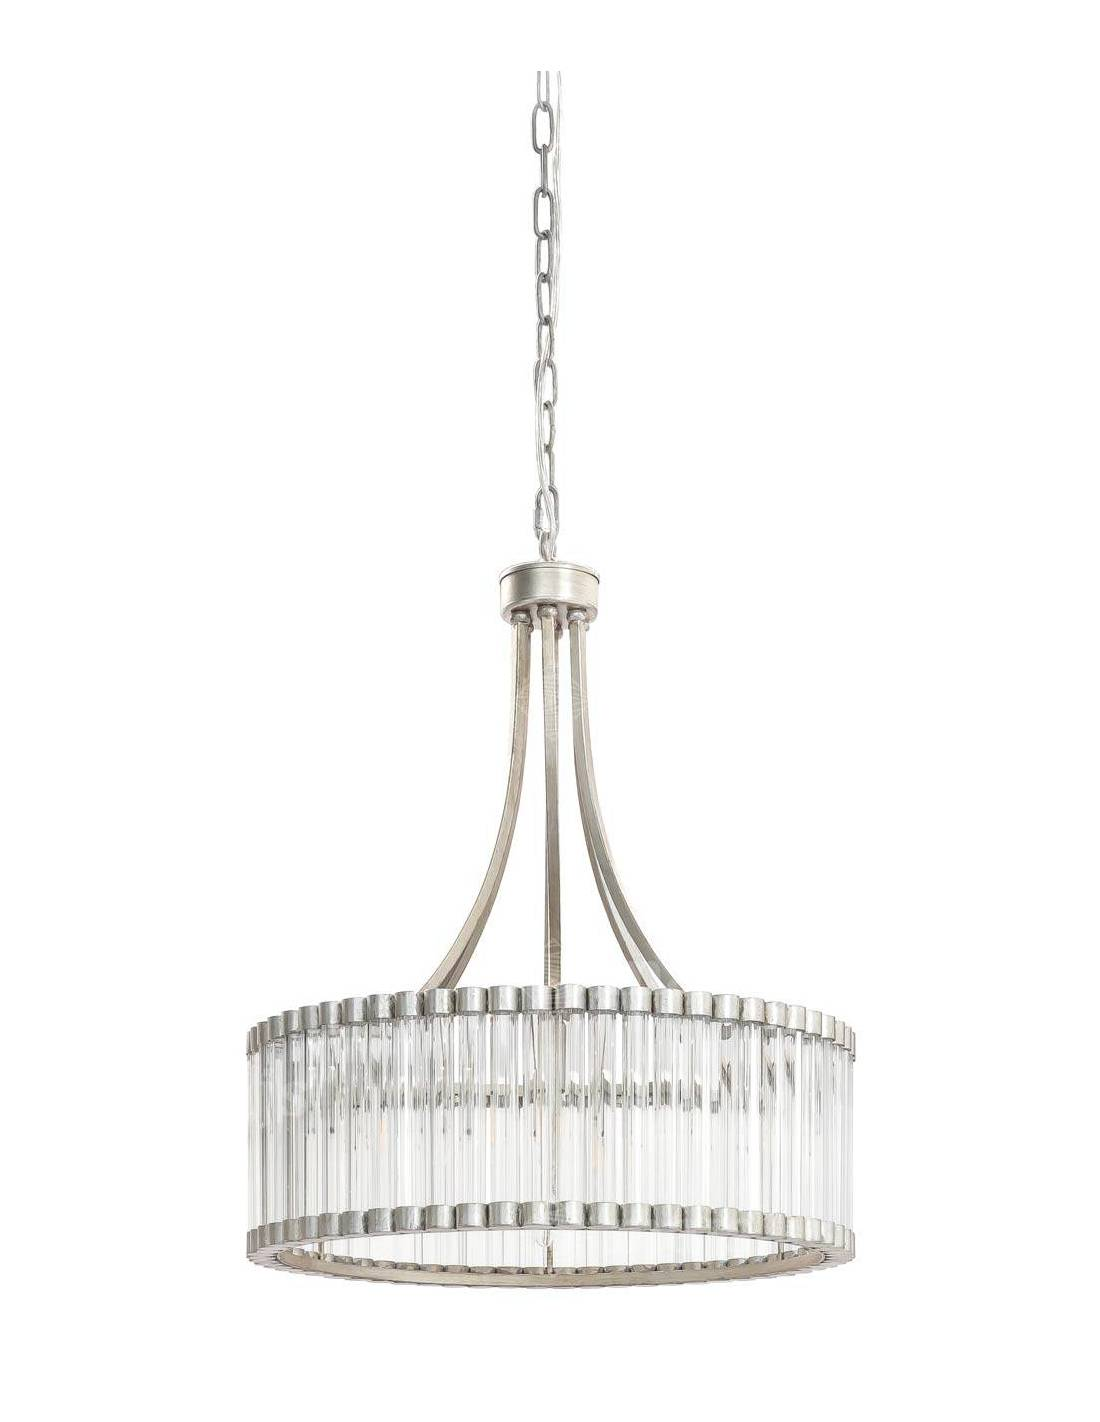 Kryształowy żyrandol glamour vintage duży 56 cm